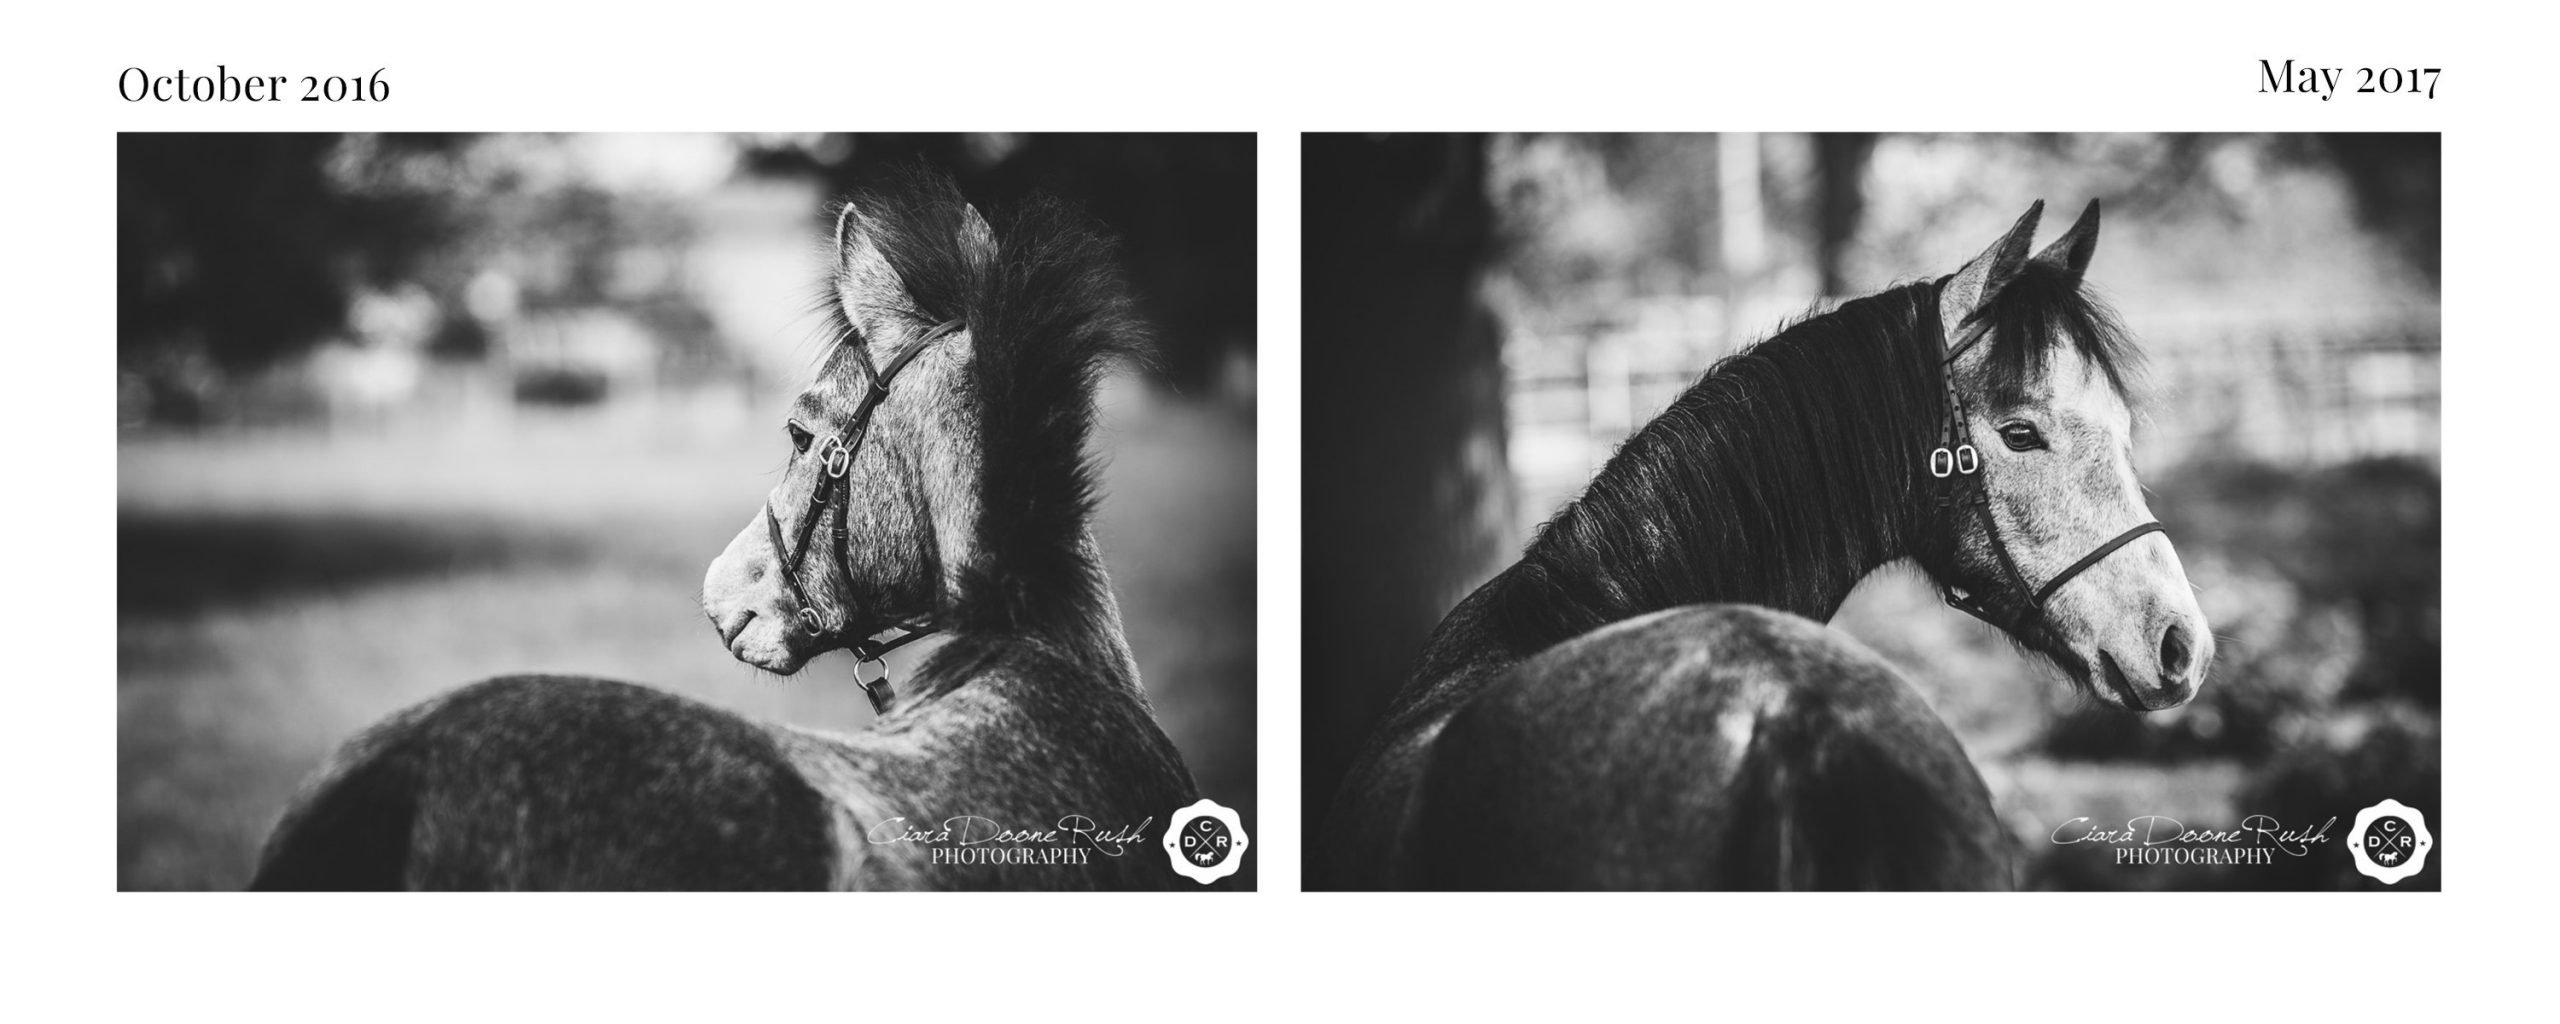 Becky & Sulwyn // A Mini Shoot Series